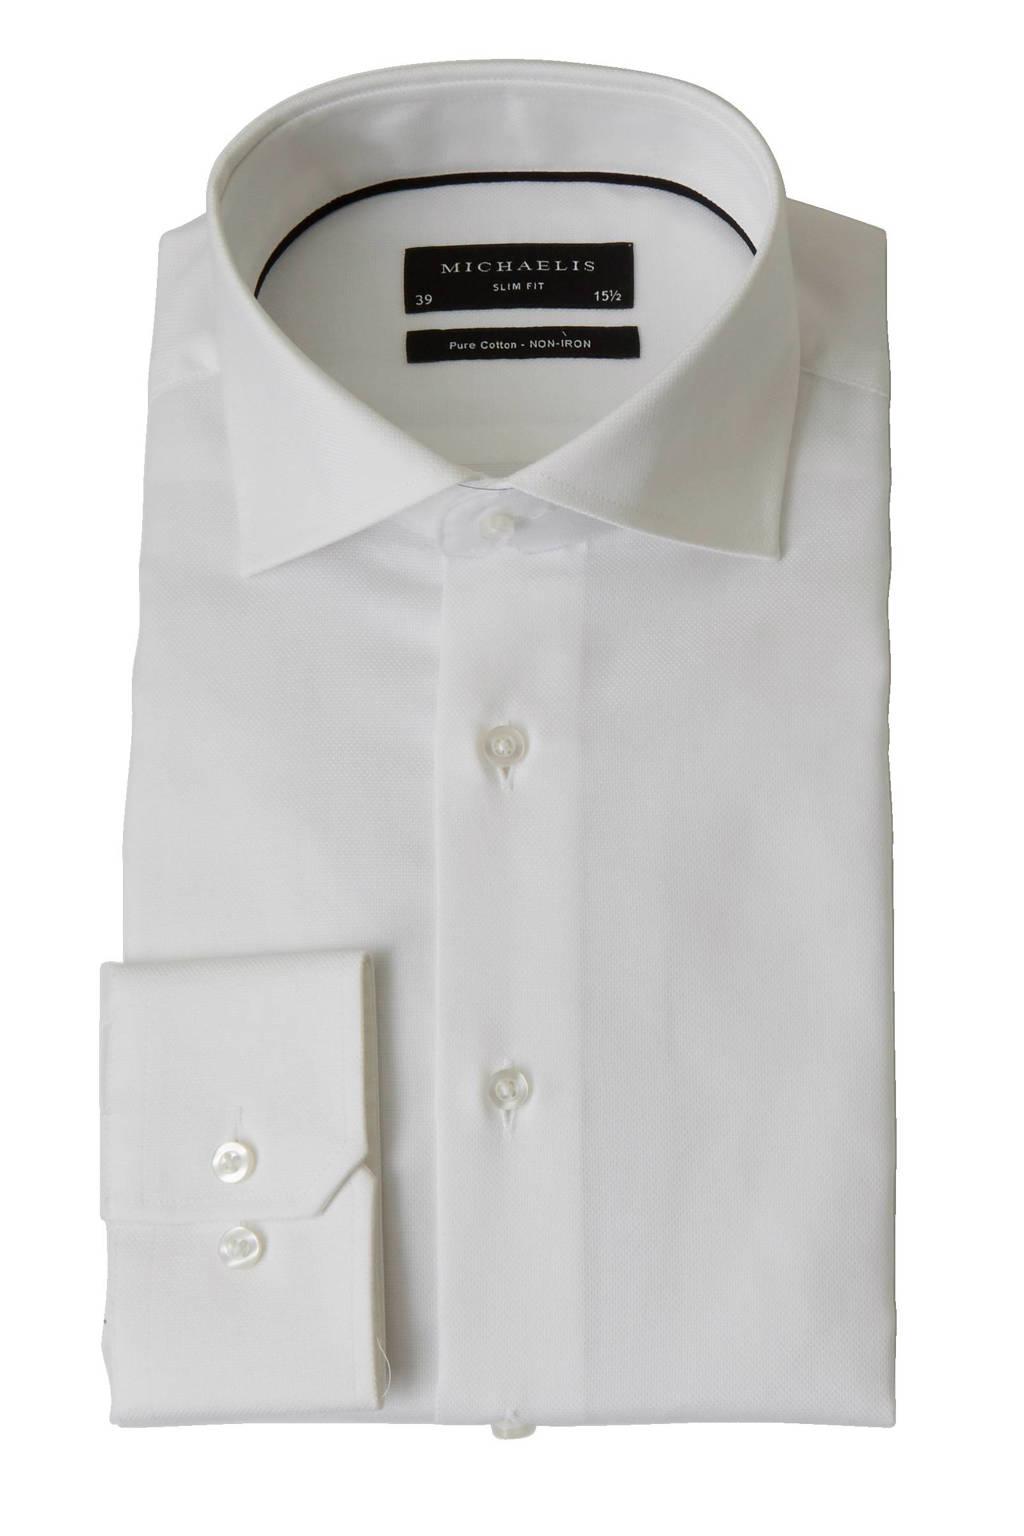 Overhemd Strijkvrij Slim Fit.Michaelis Slim Fit Overhemd Wehkamp